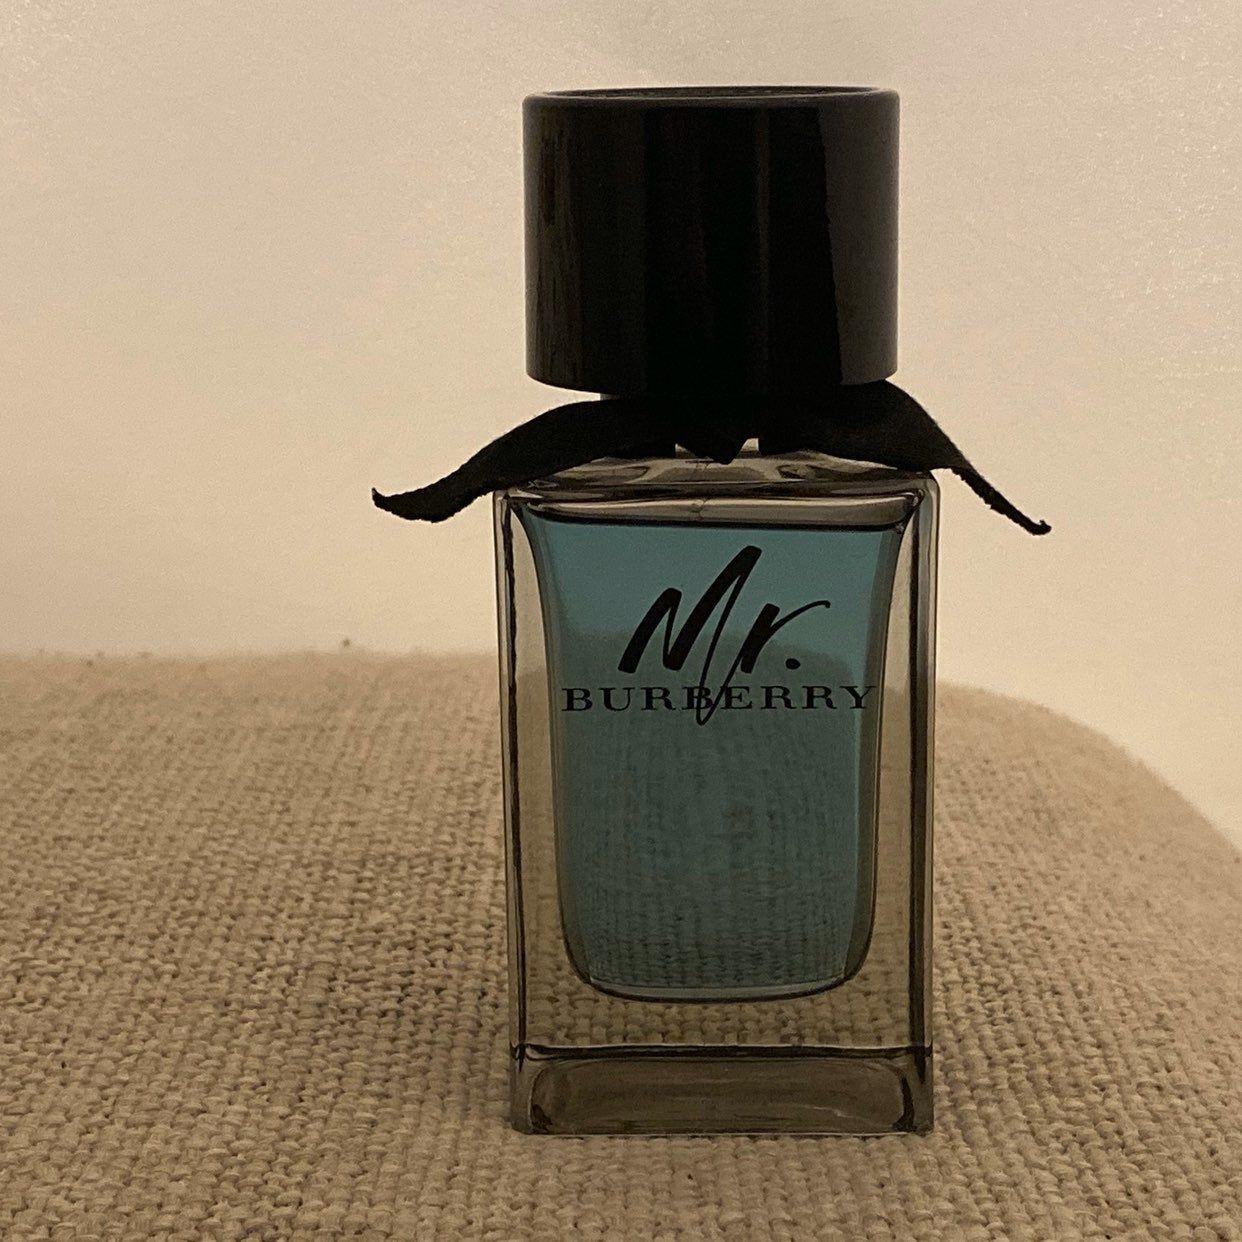 Mr Burberry Men S Cologne Spray Bottle 3 3 Fl Oz In Great Like New Condition Burberry Men Cologne Spray Perfume Bottles